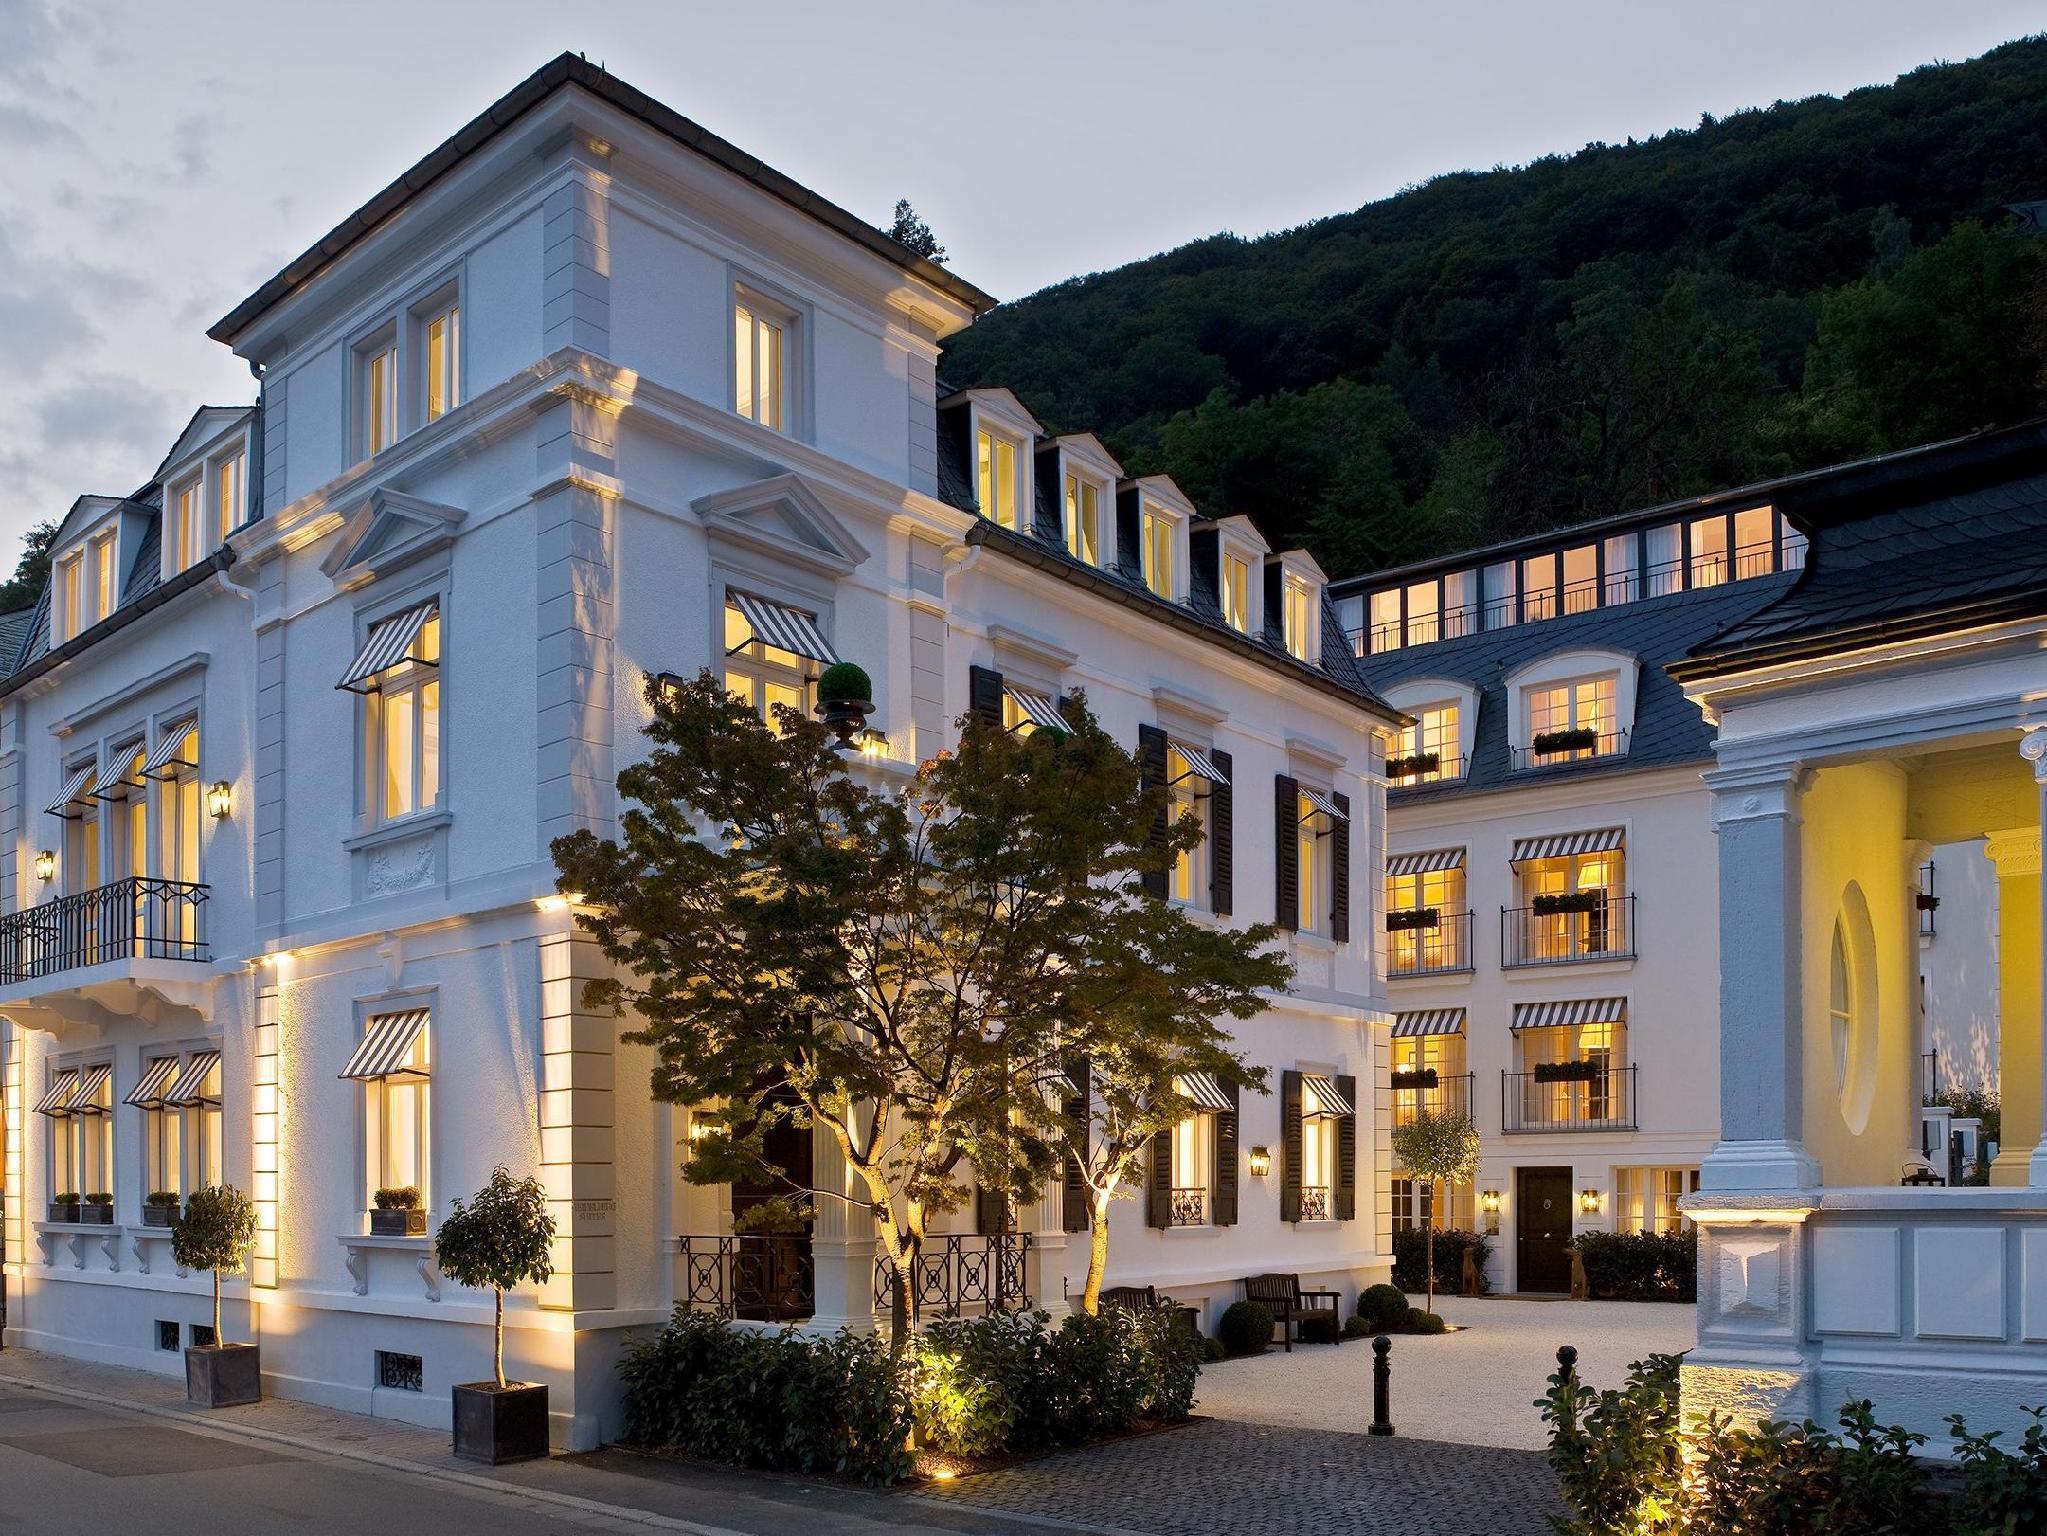 Boutique Hotel Heidelberg Suites - Heidelberg